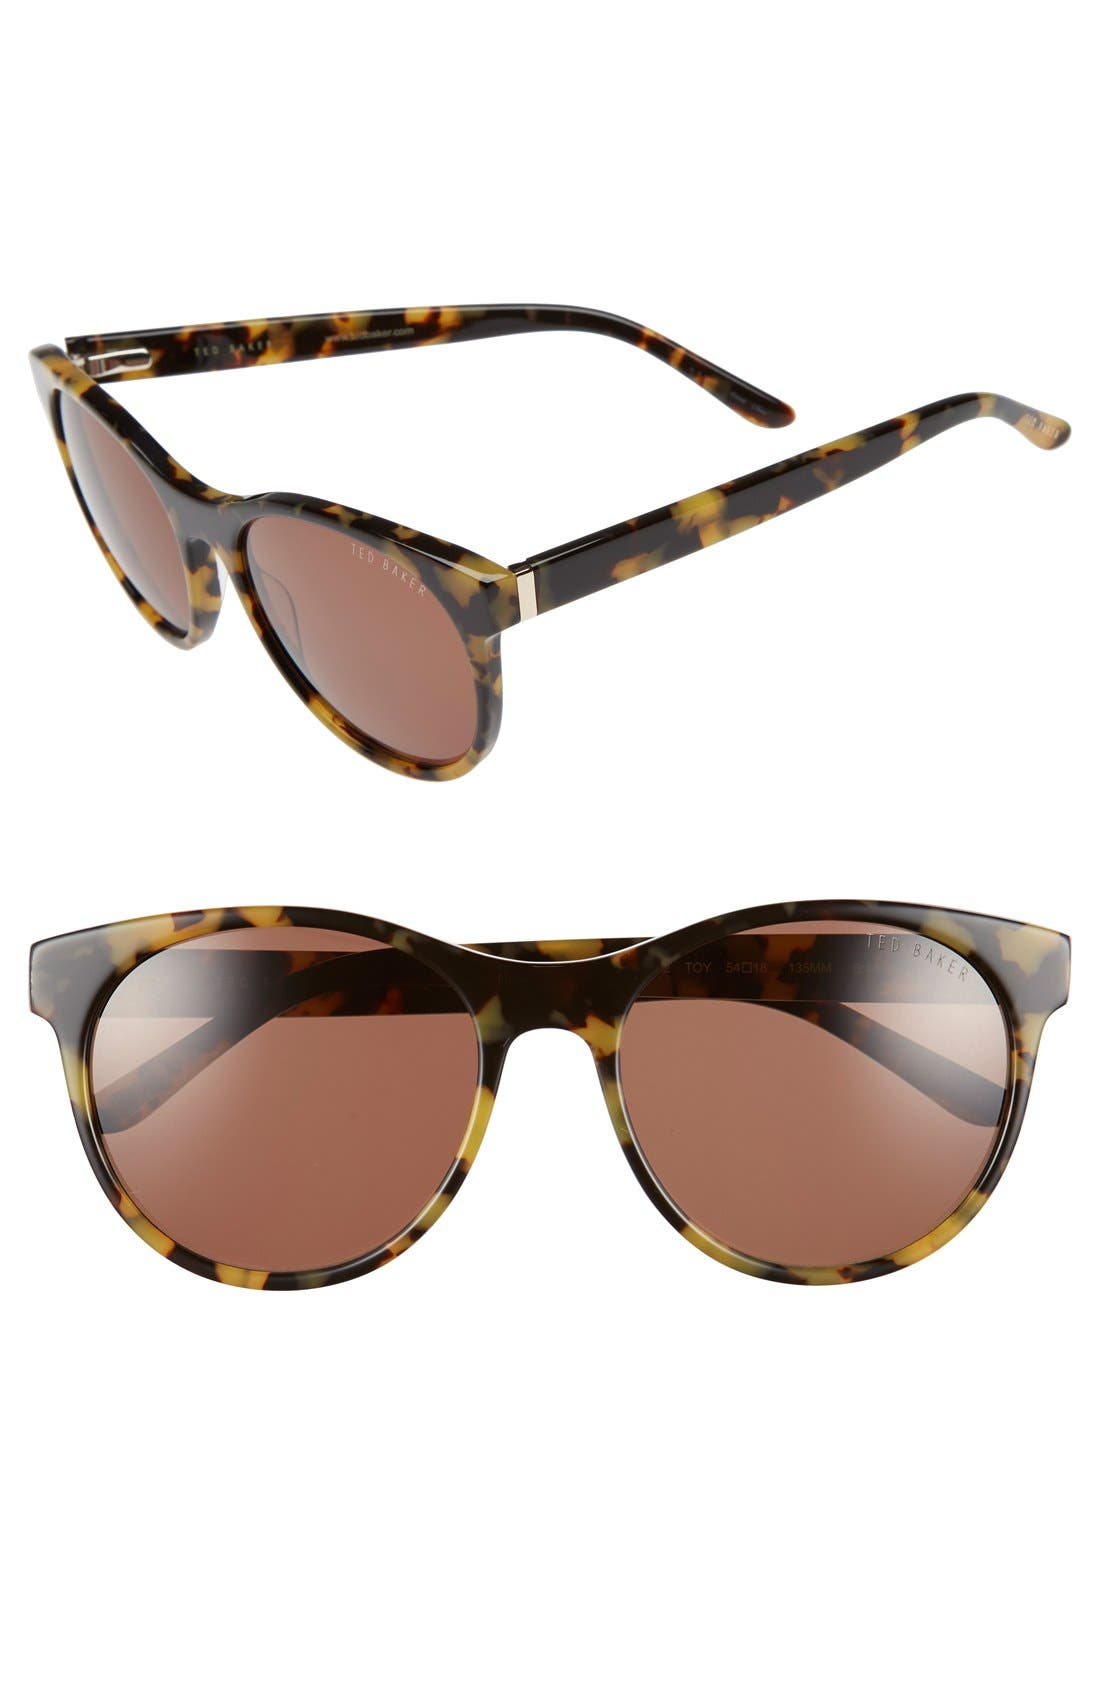 54mm Retro Sunglasses,                             Main thumbnail 1, color,                             201